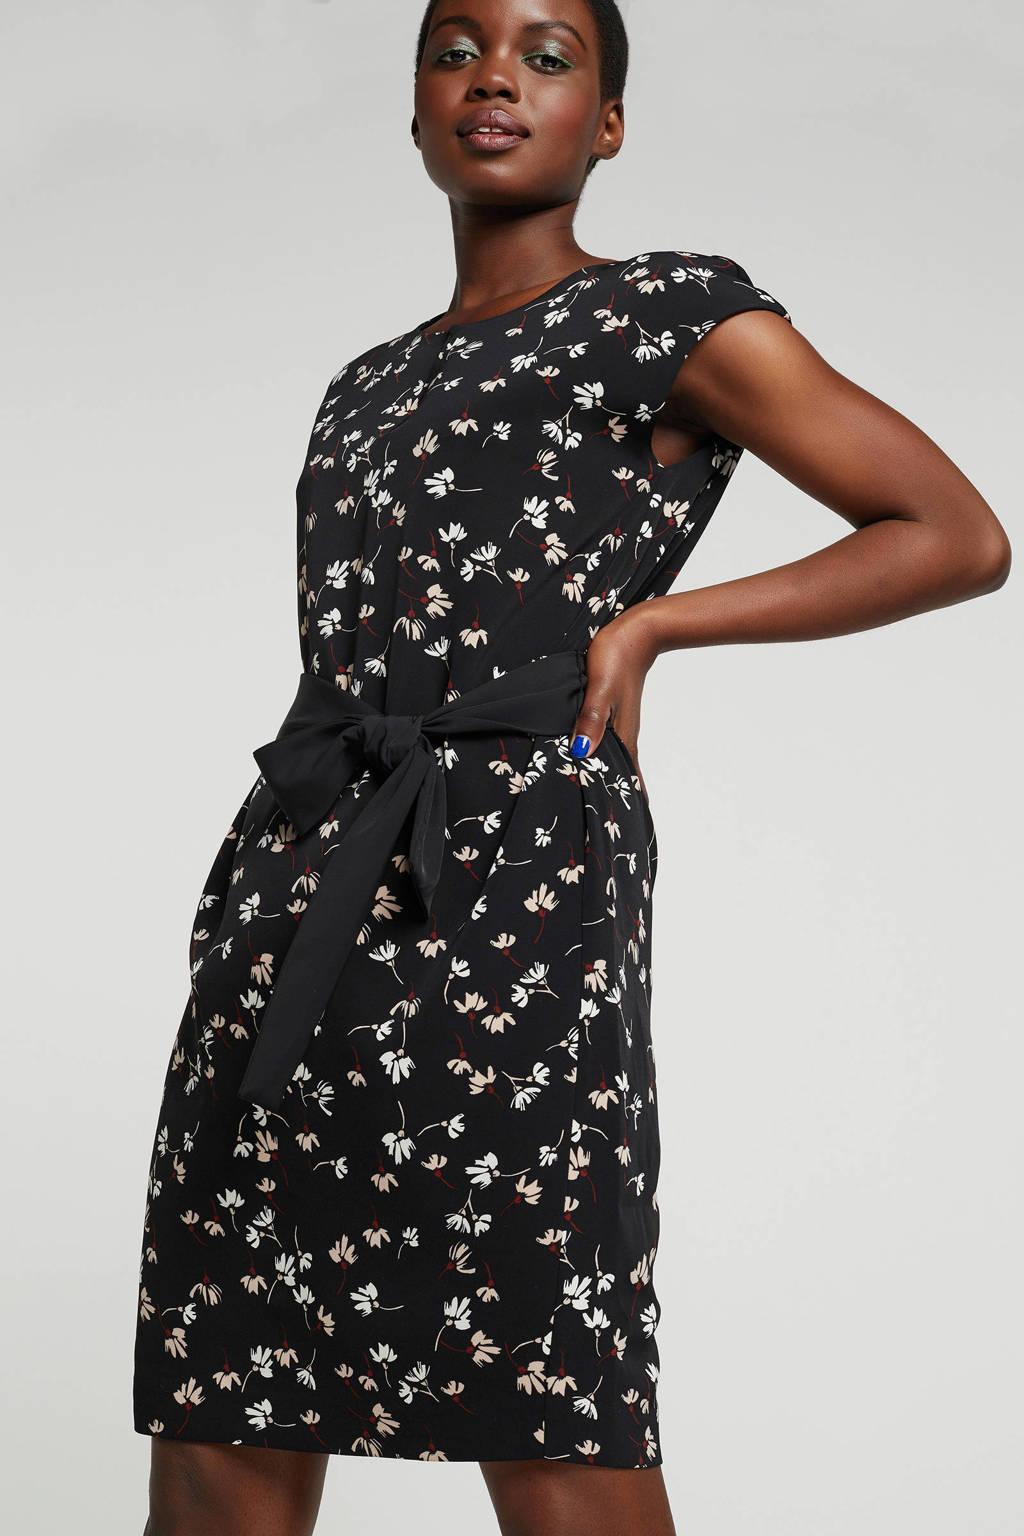 Inwear gebloemde jurk zwart, Zwart